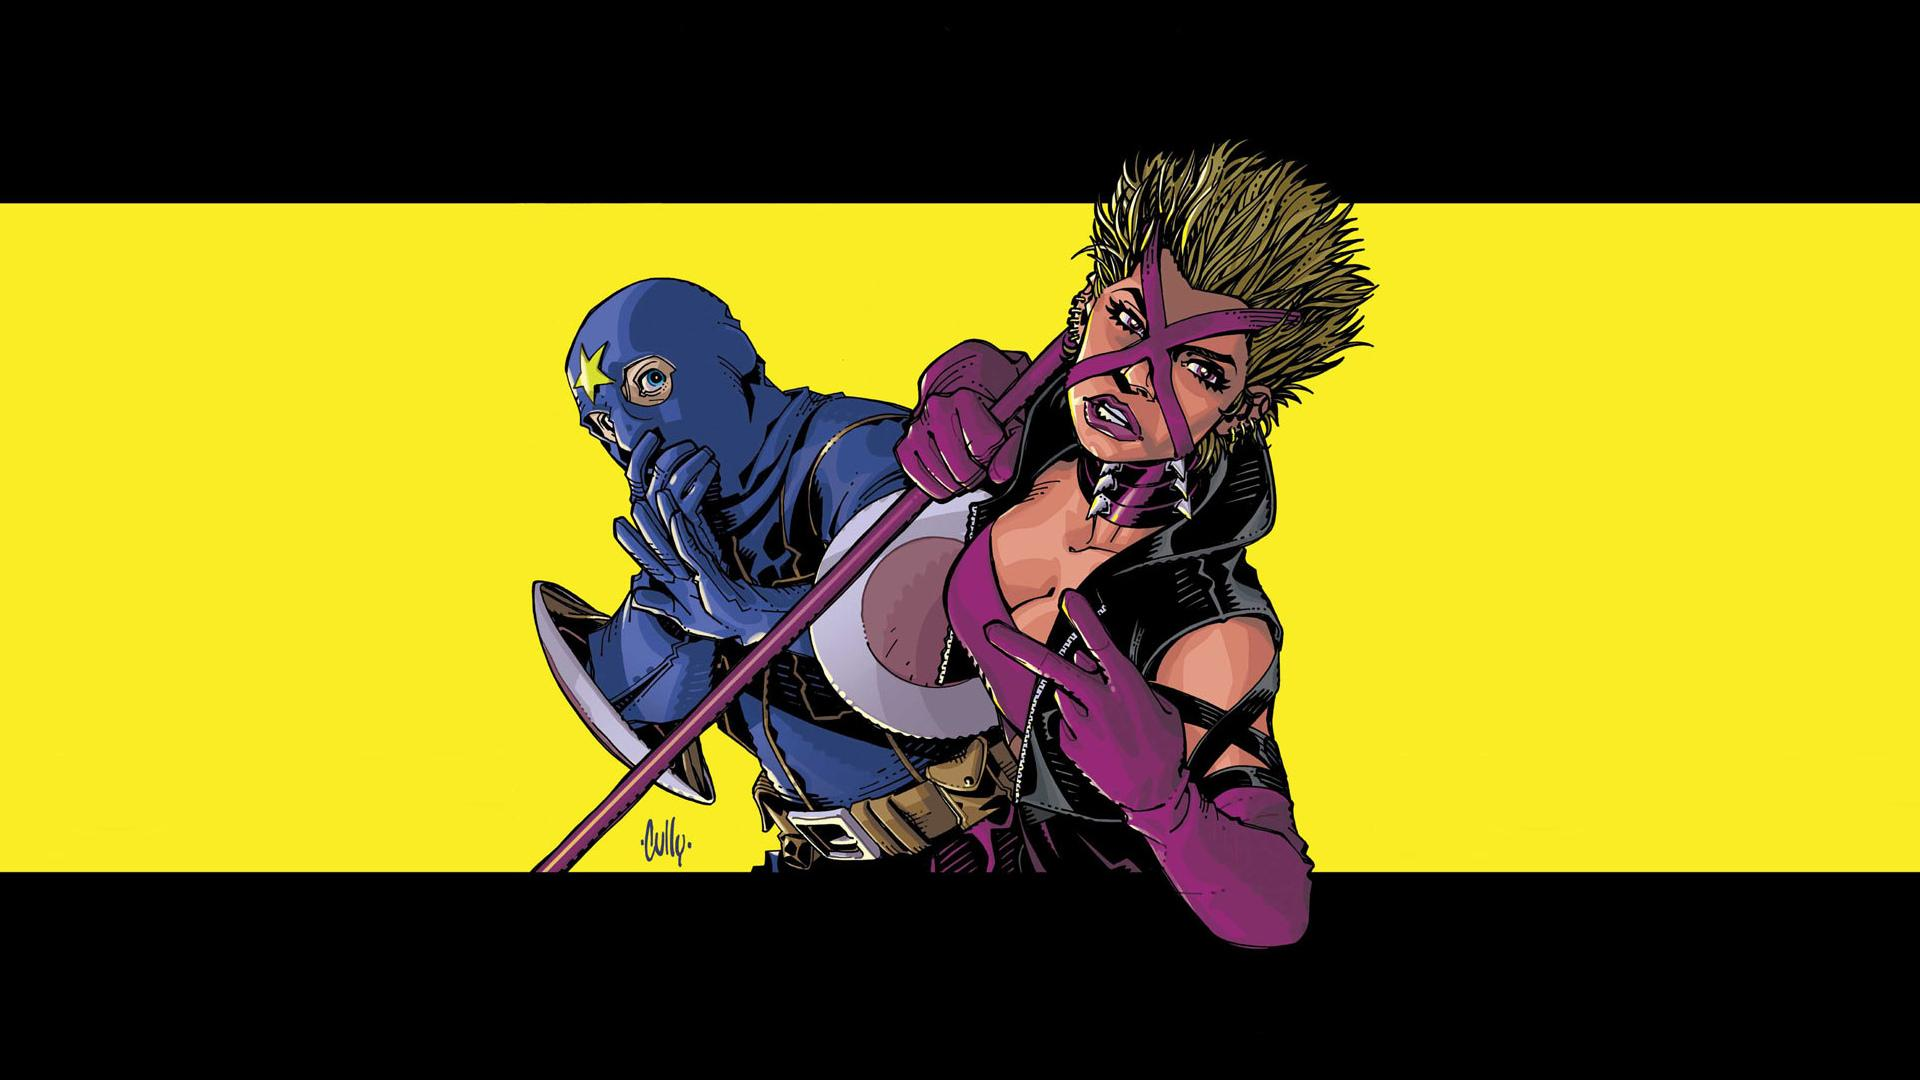 Kick-Ass Comics wallpapers HD quality